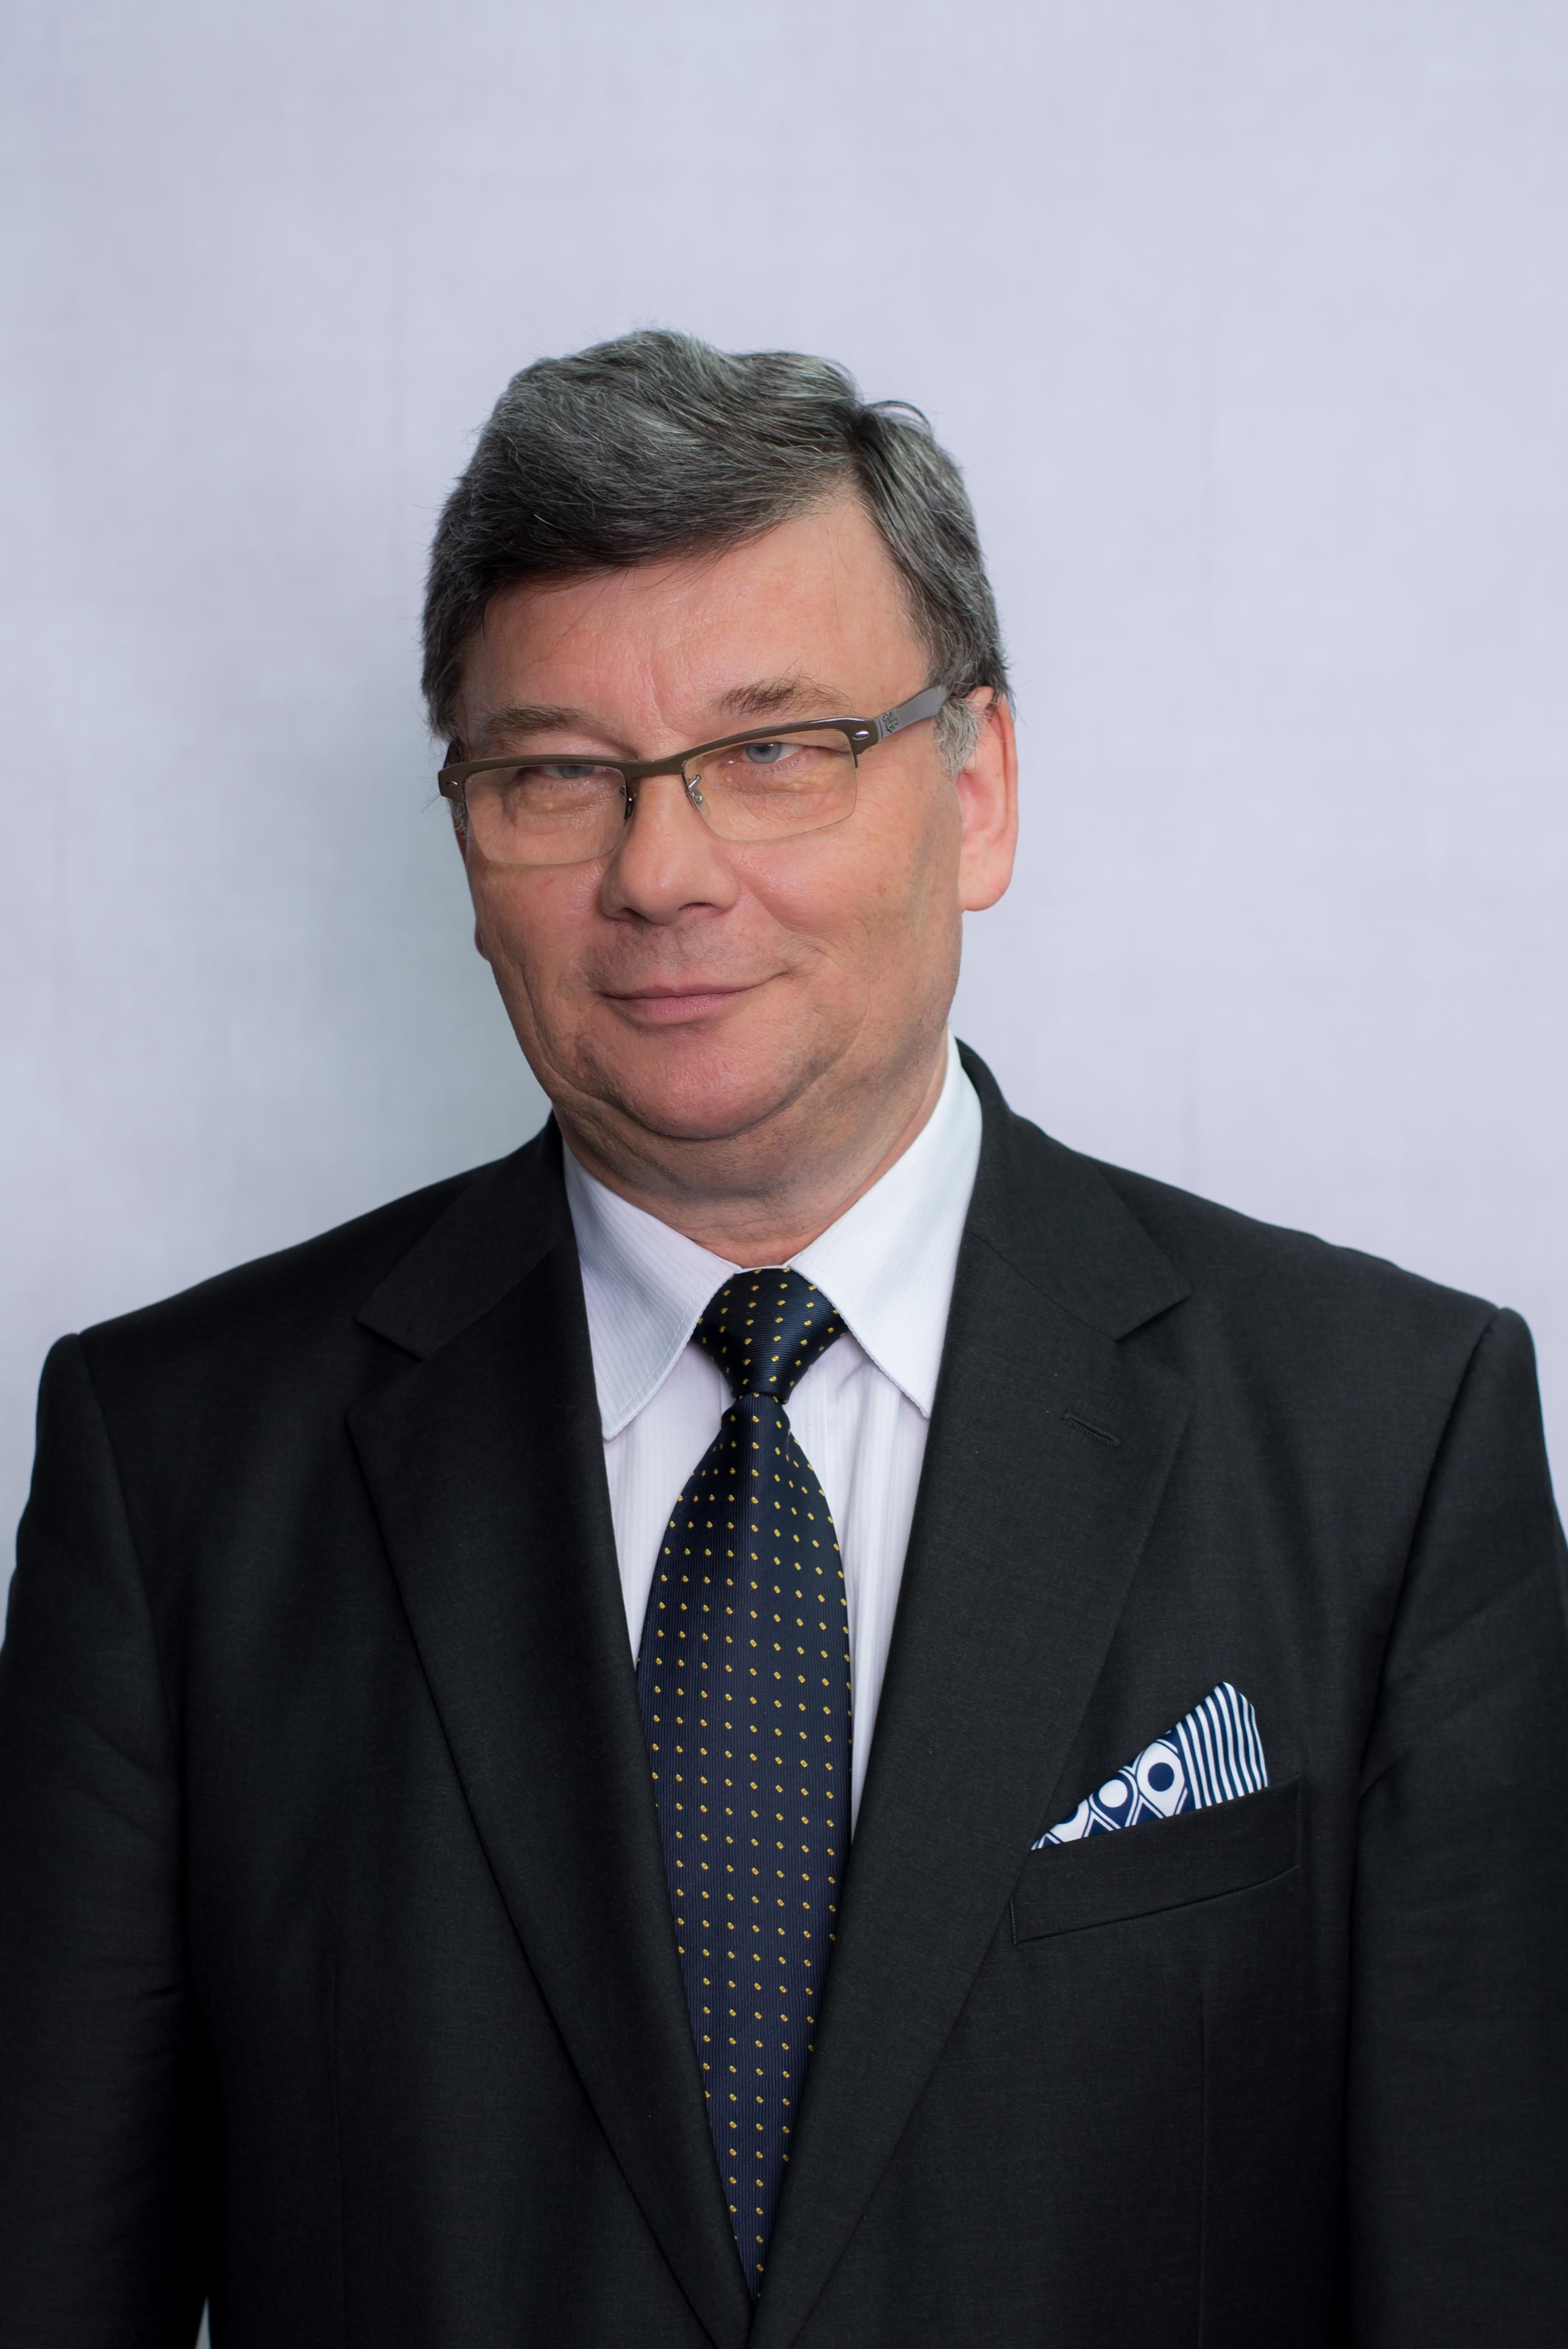 Prof. Jerzy Boehlke, dziekan@econ.uni.torun.pl office tel. no. +48 56 611-4608